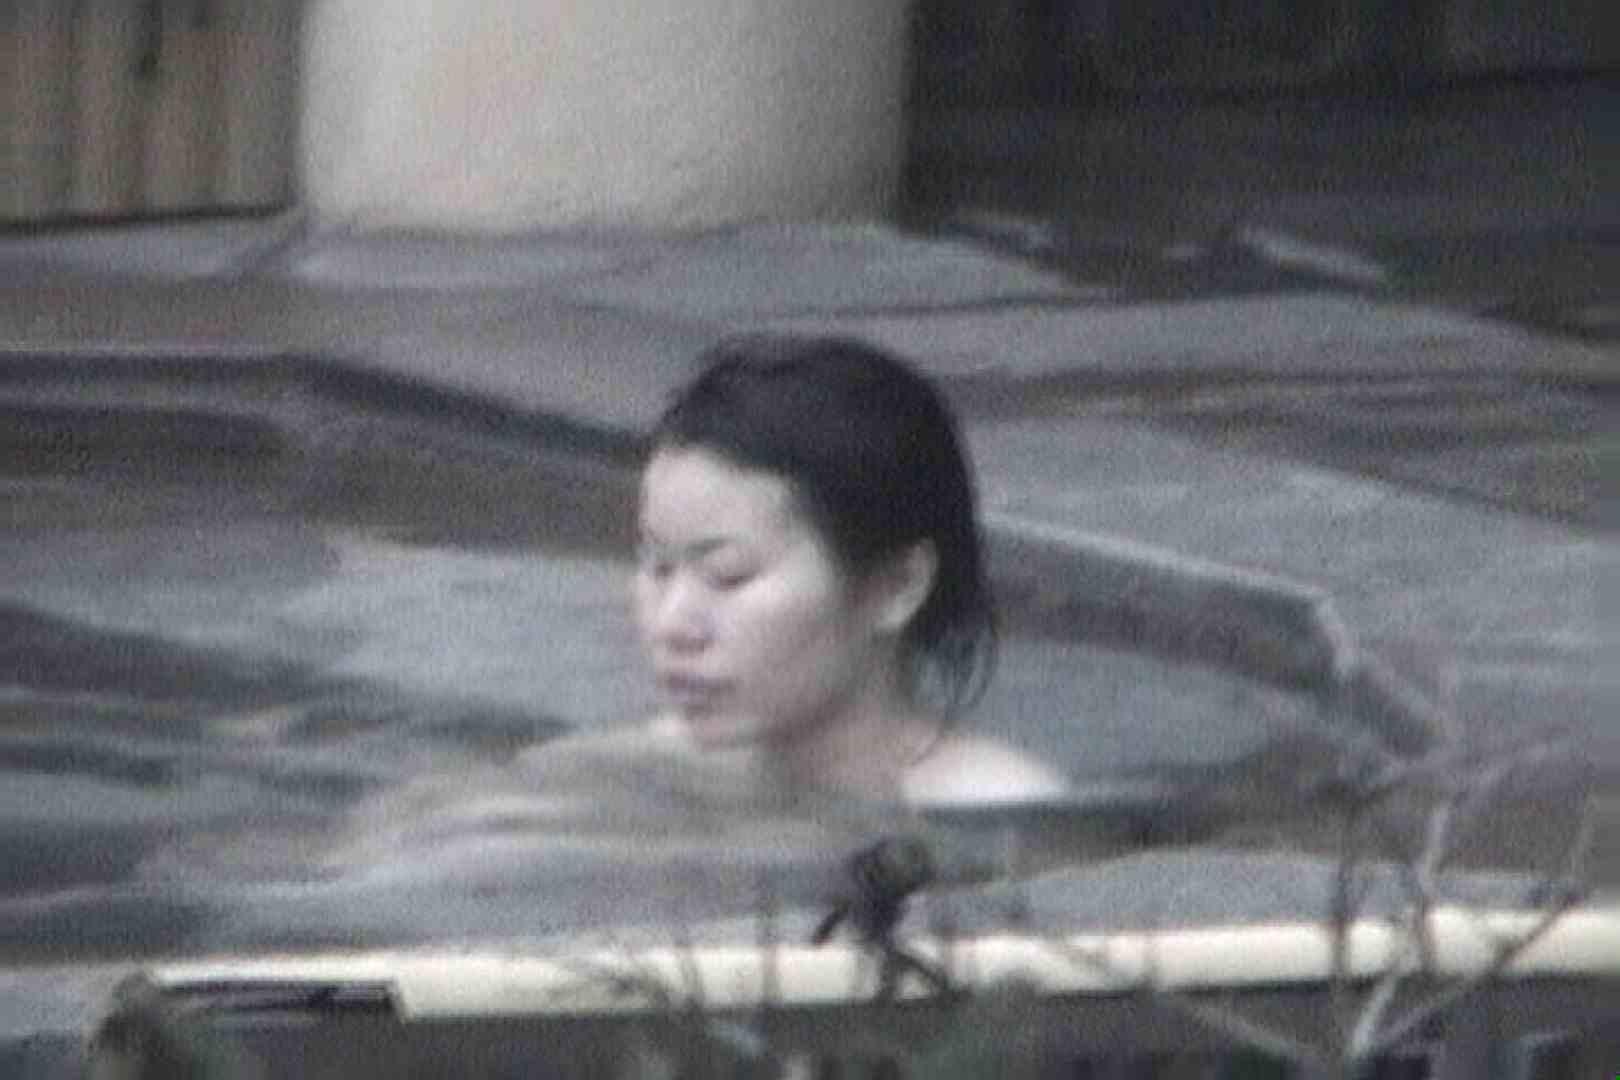 Aquaな露天風呂Vol.556 美しいOLの裸体 すけべAV動画紹介 69pic 62